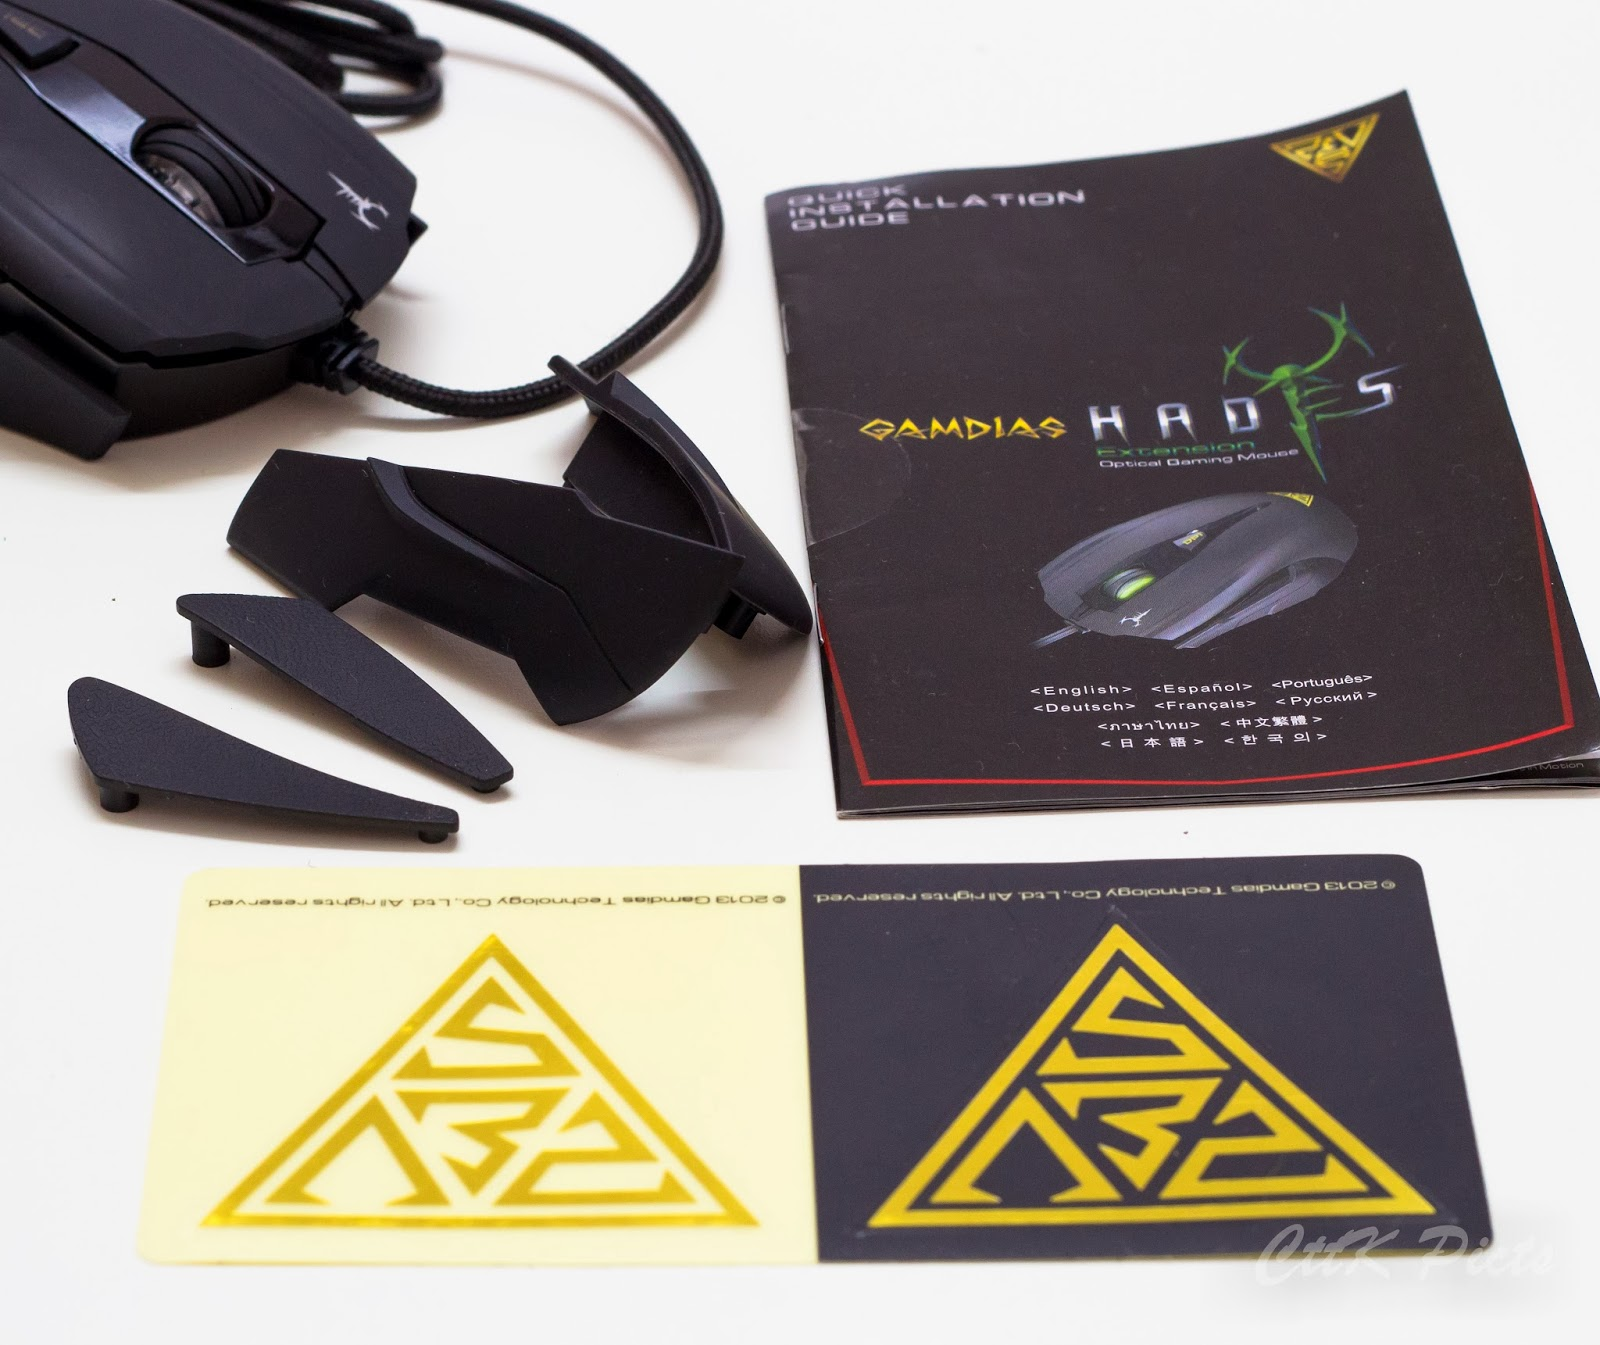 Gamdias Hades Extension Optical Gaming Mouse 57